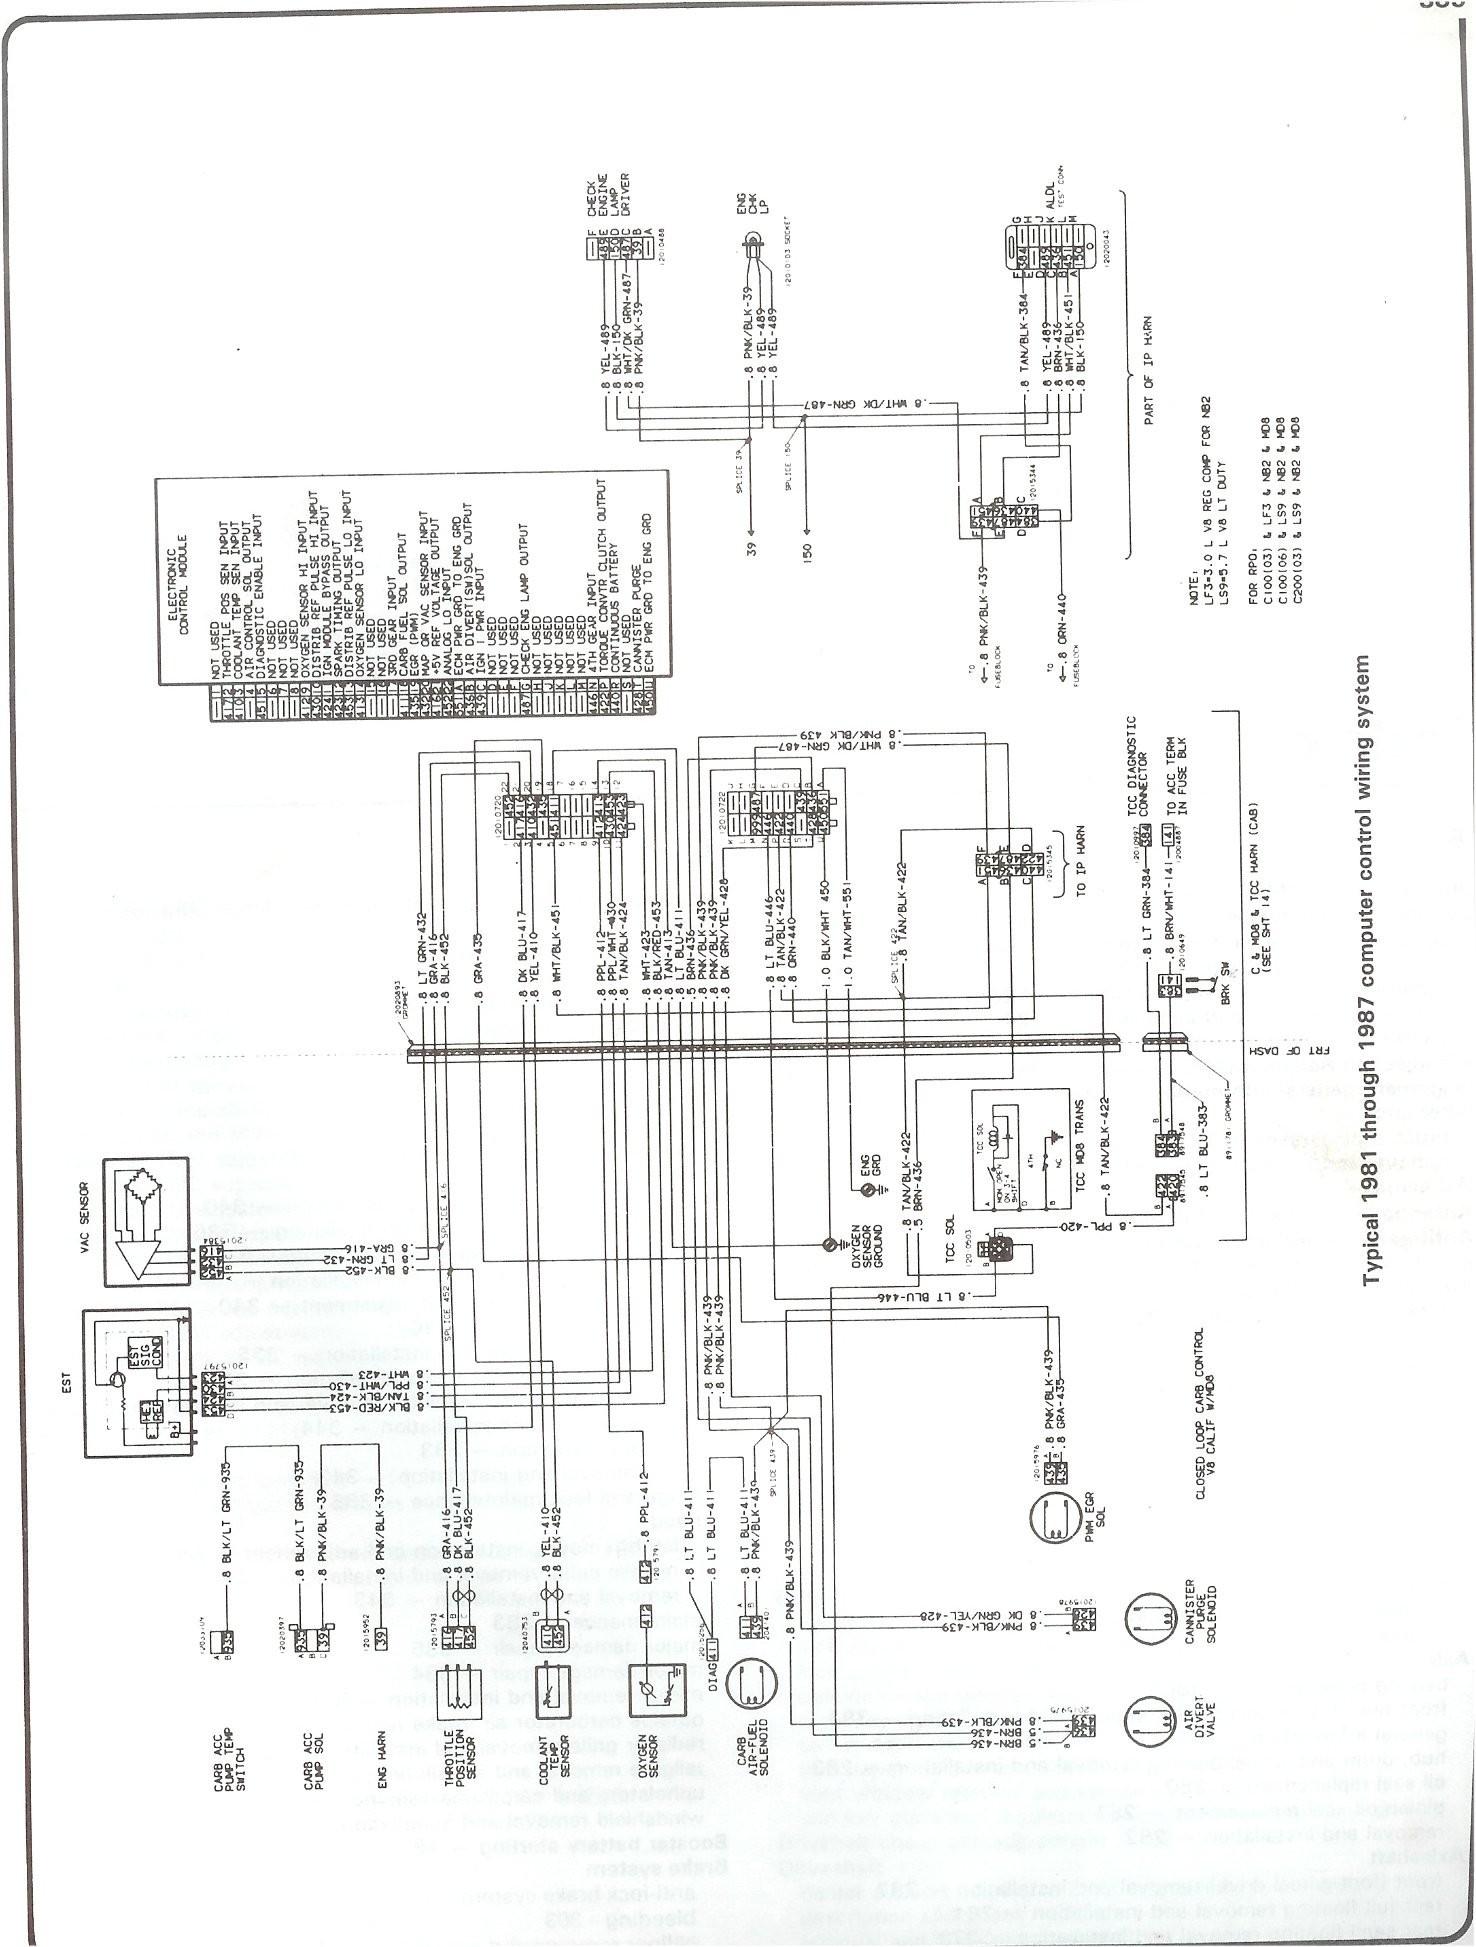 98 Chevy Blazer Engine Diagram Chevy Blazer Wiring Harness Diagram Wiring Diagram Rows